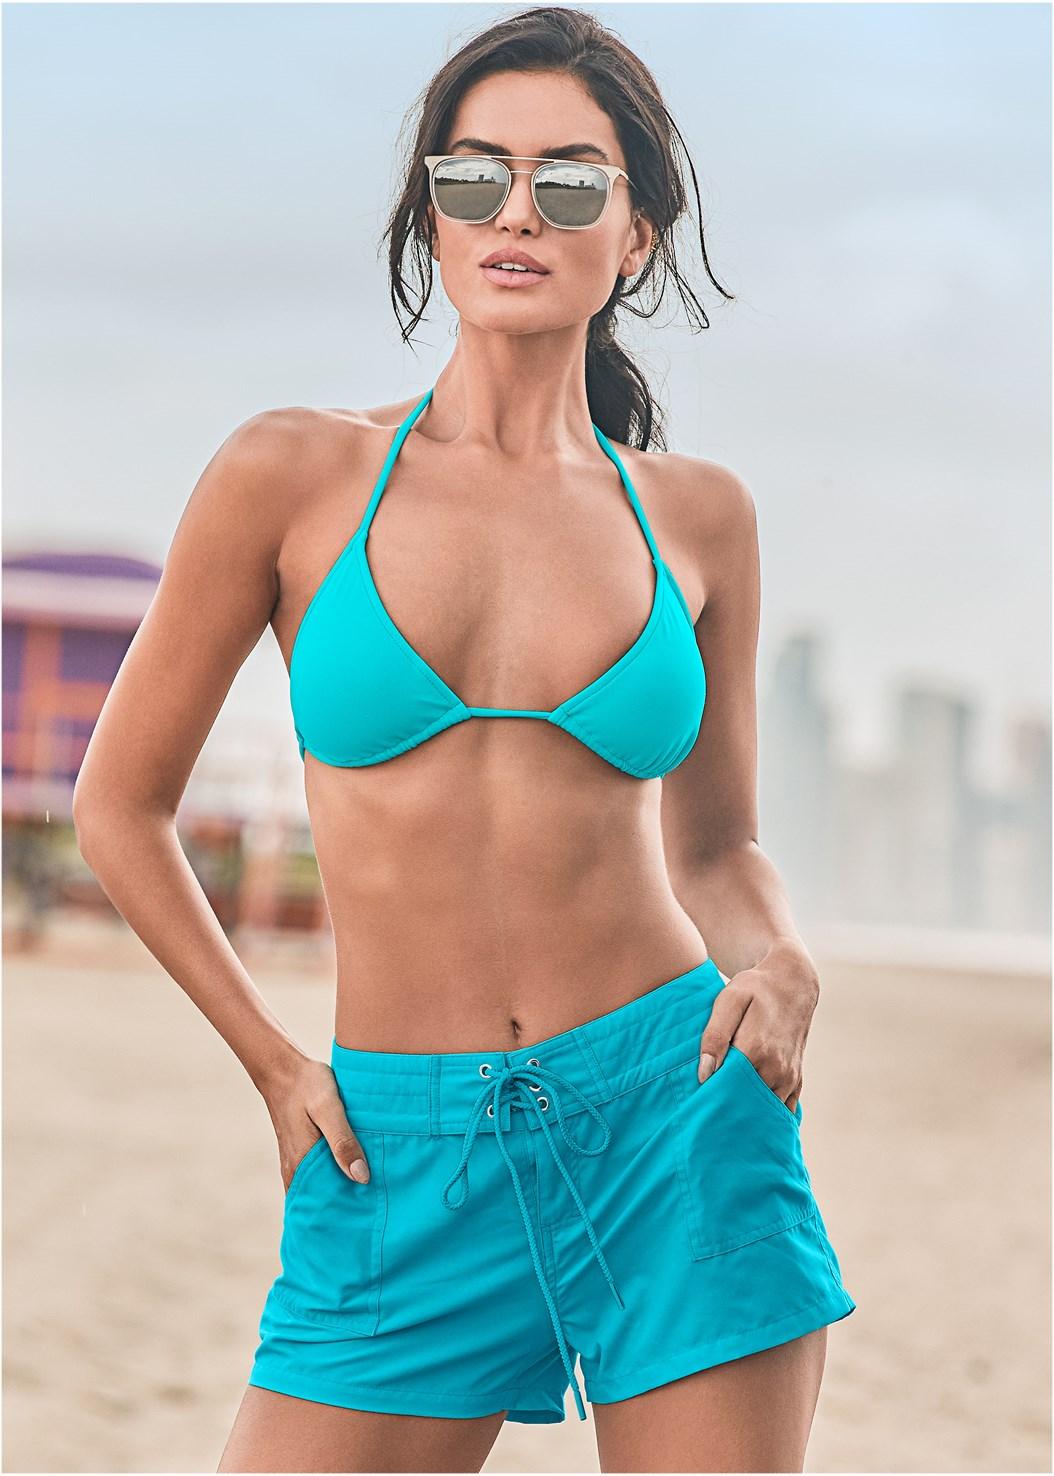 Board Short Cover-Up,Triangle String Bikini Top,String Side Bikini Bottom